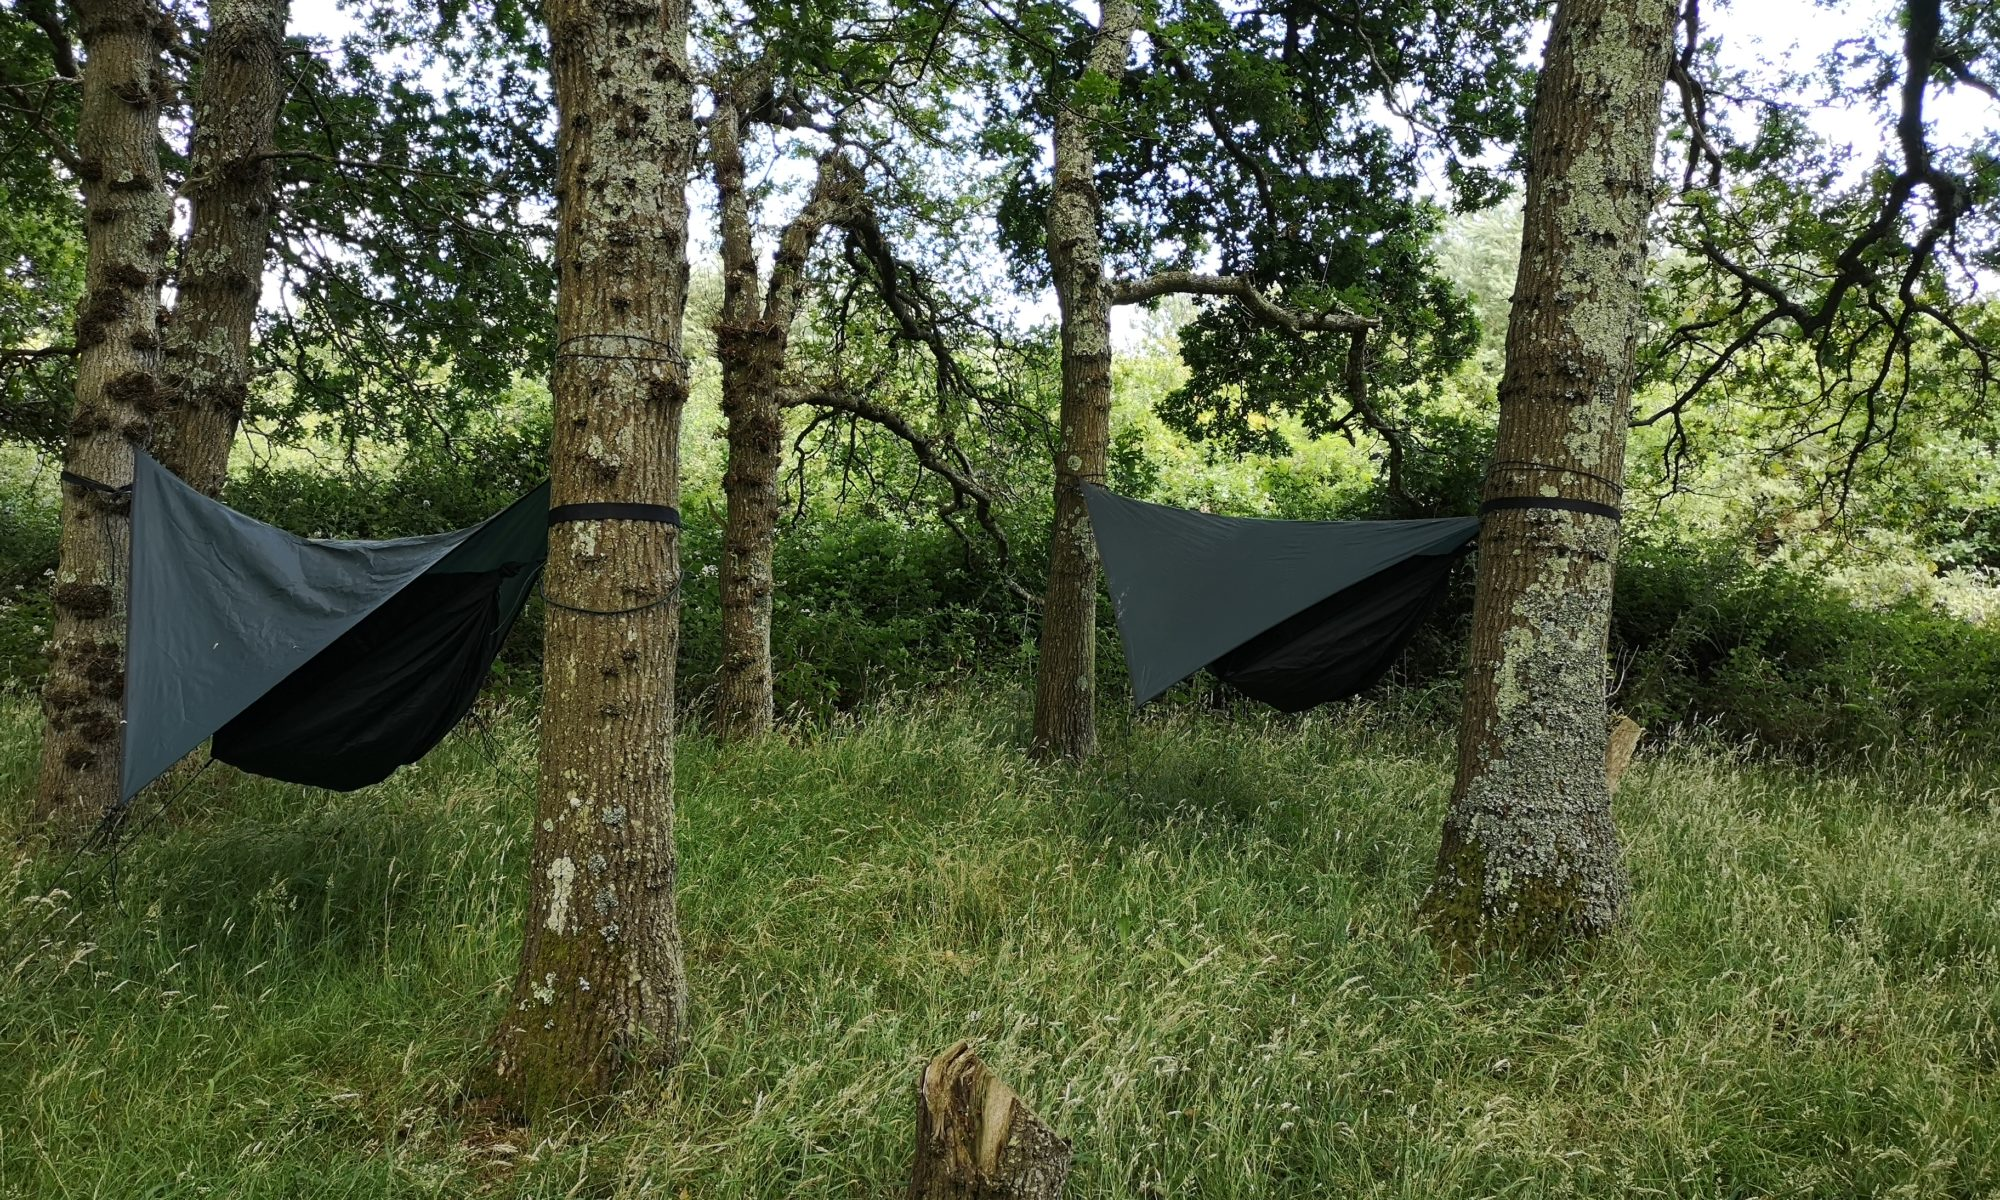 Hire a Hammock at Camp Wight